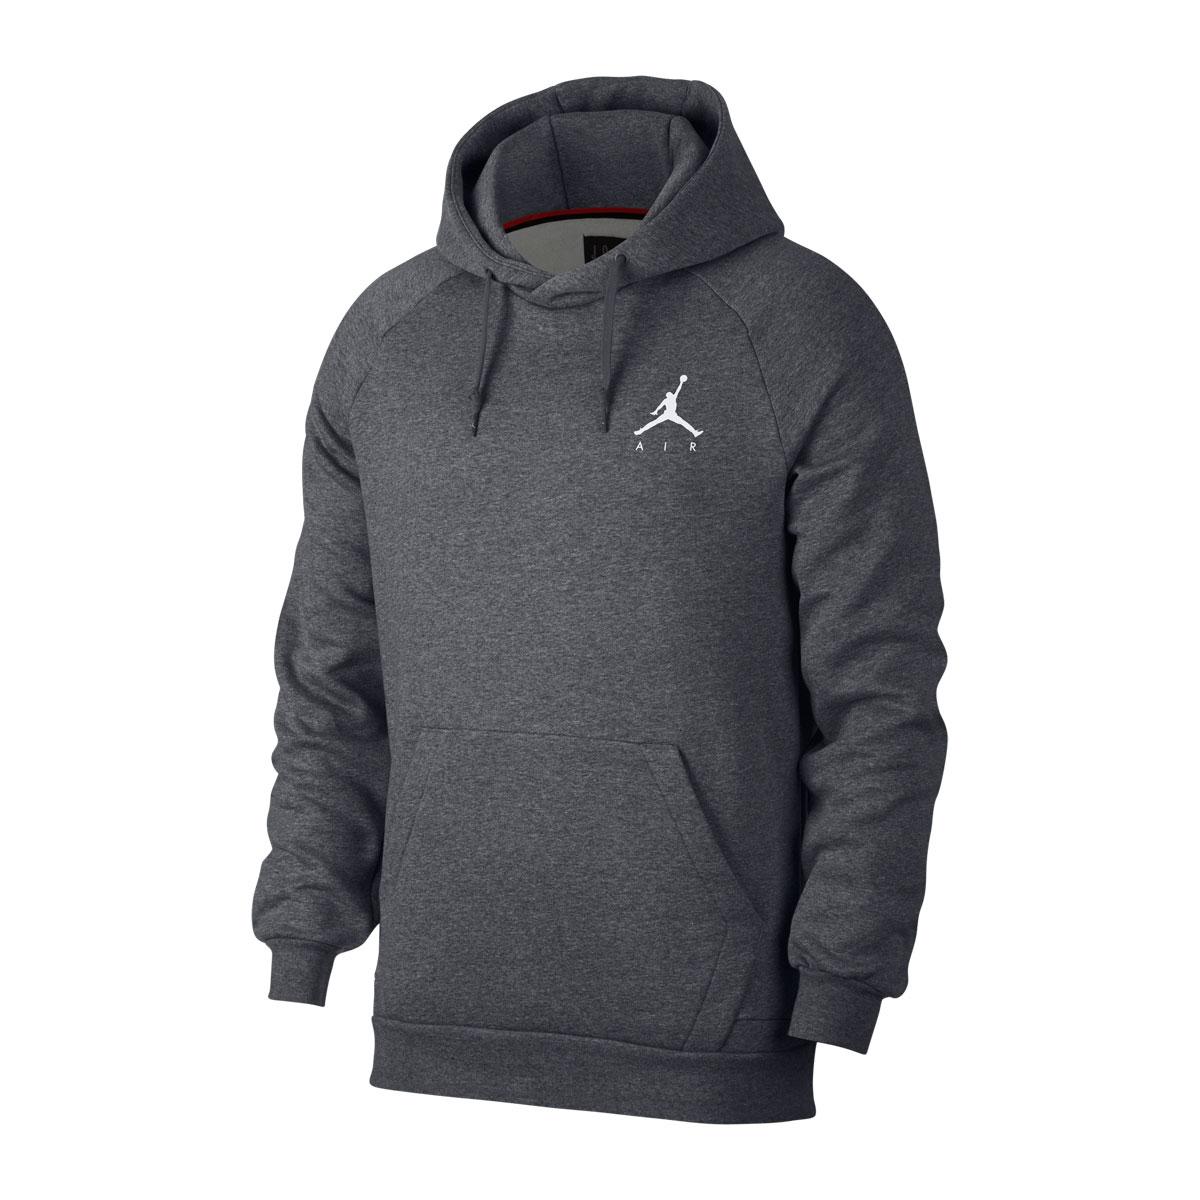 fe47b922929b87 The Jordan sportswear jump man fleece men pullover blocks cold stylishly.  Using a tender raised fleece material